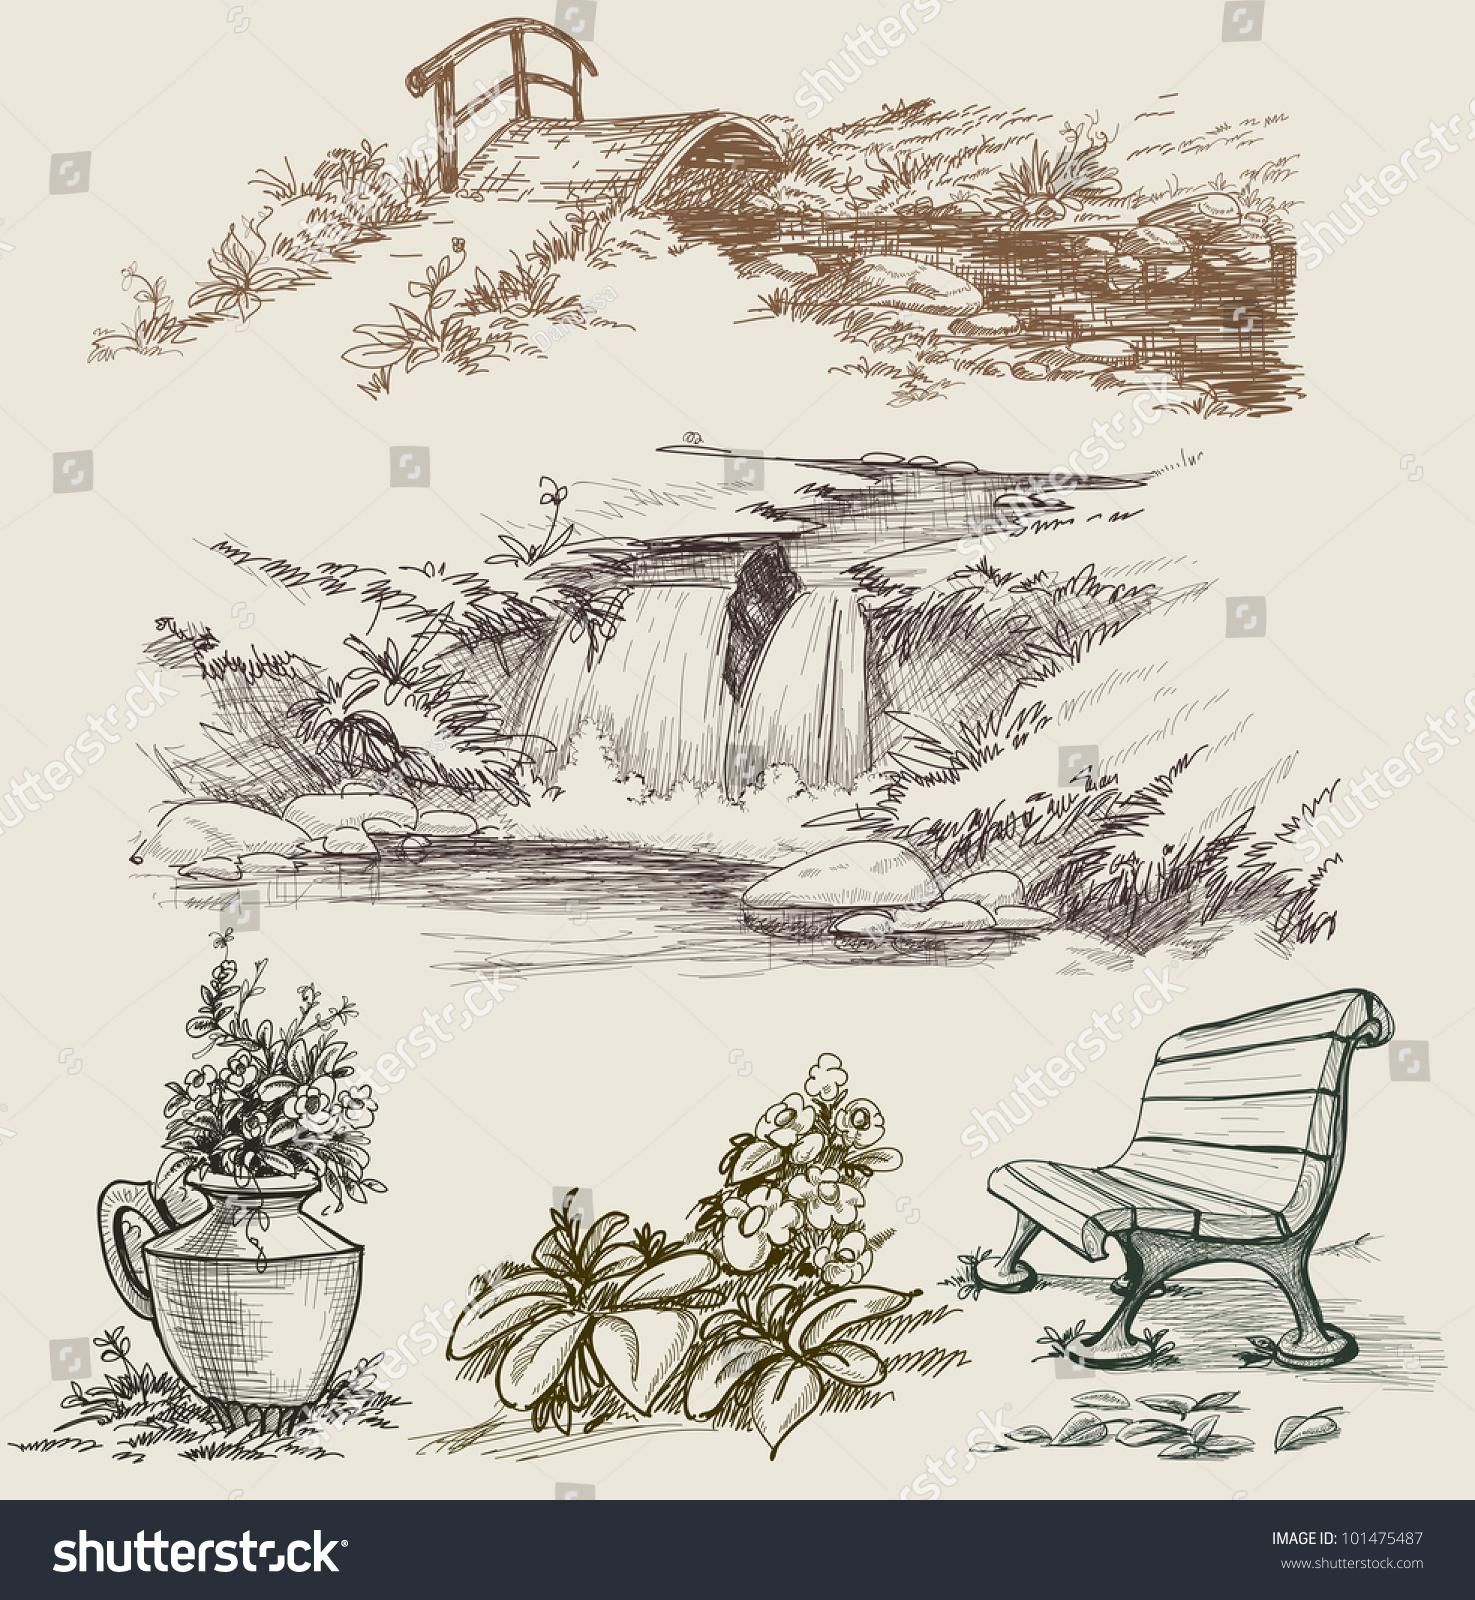 Park or garden design elements stock vector illustration for Garden design elements